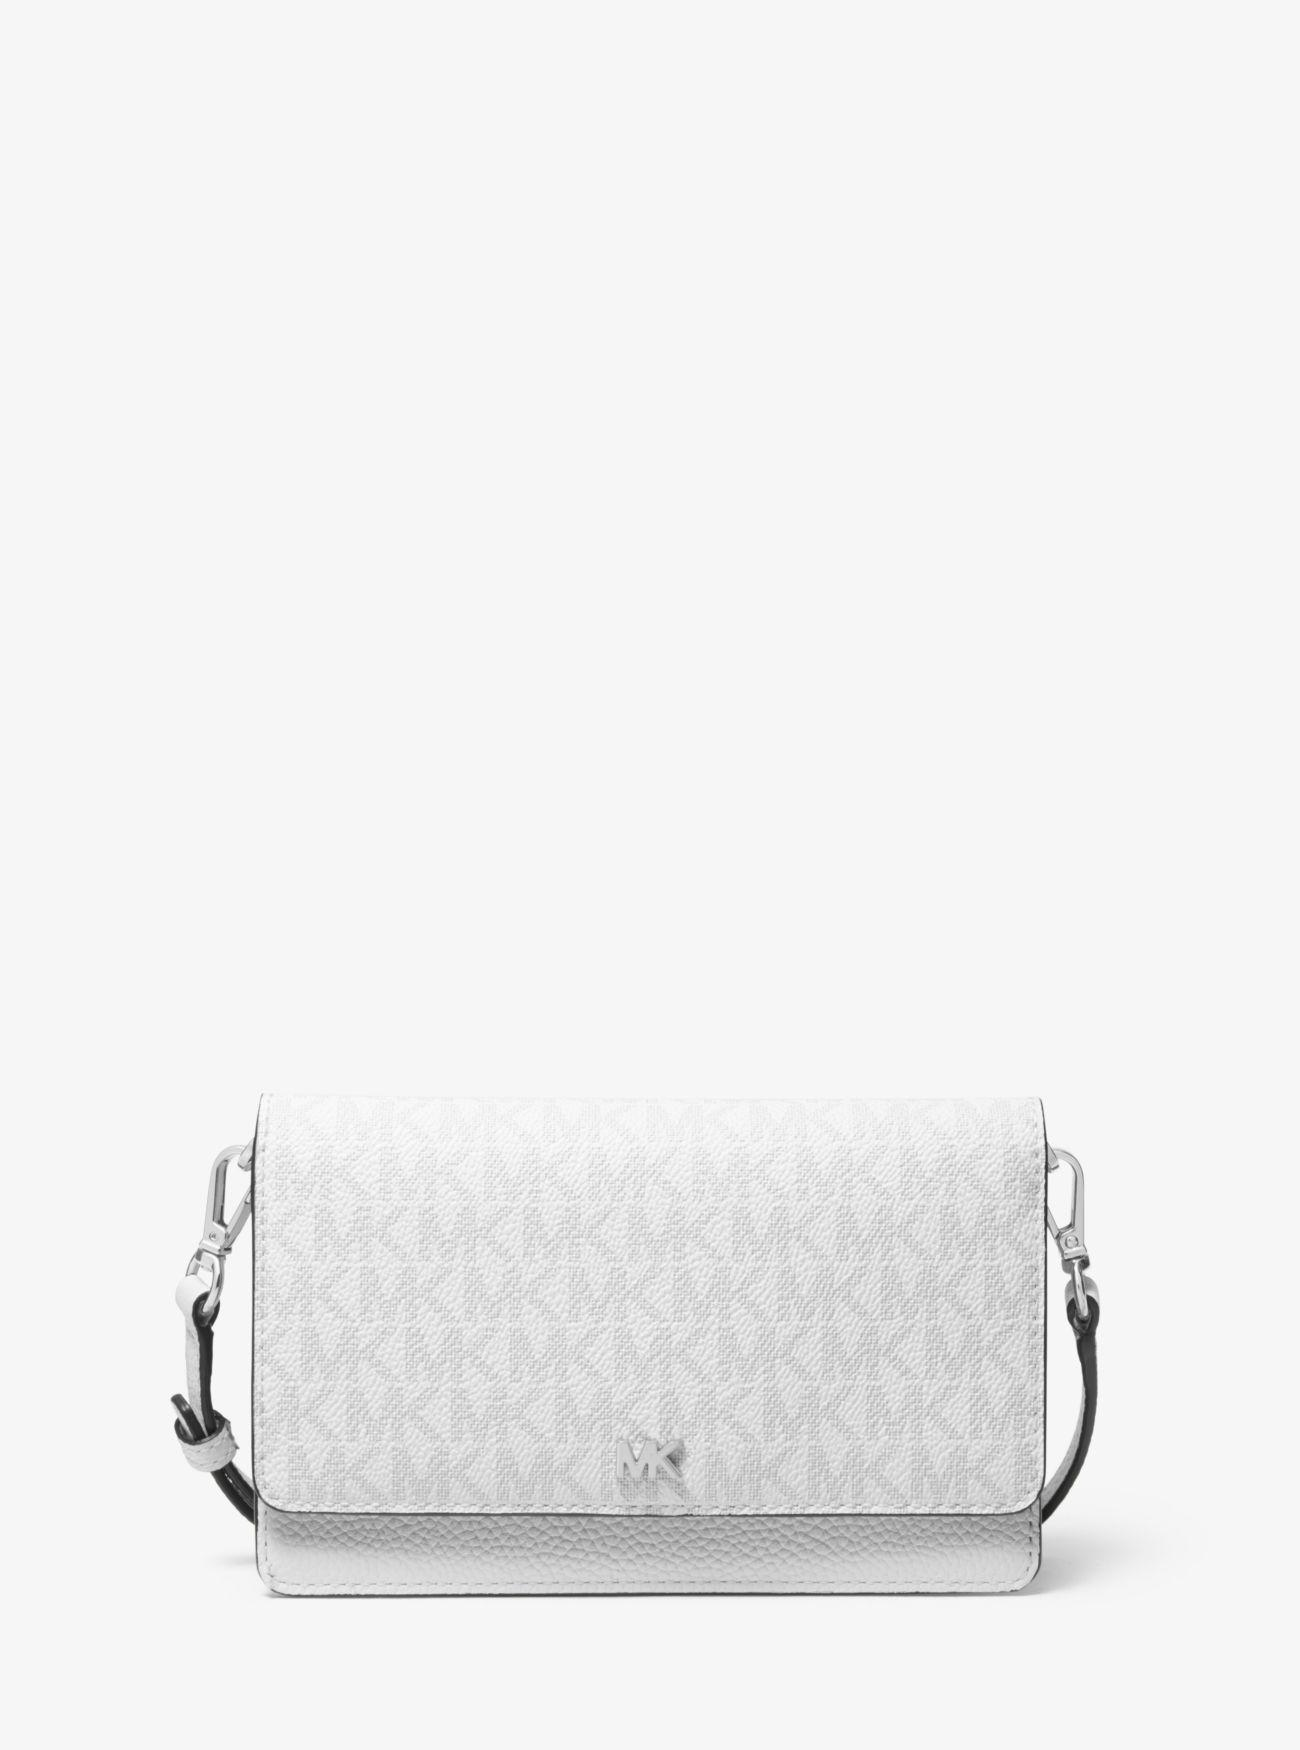 c097266e3a83 MICHAEL Michael Kors. Women's White Pebbled Leather And Logo Convertible  Crossbody Bag